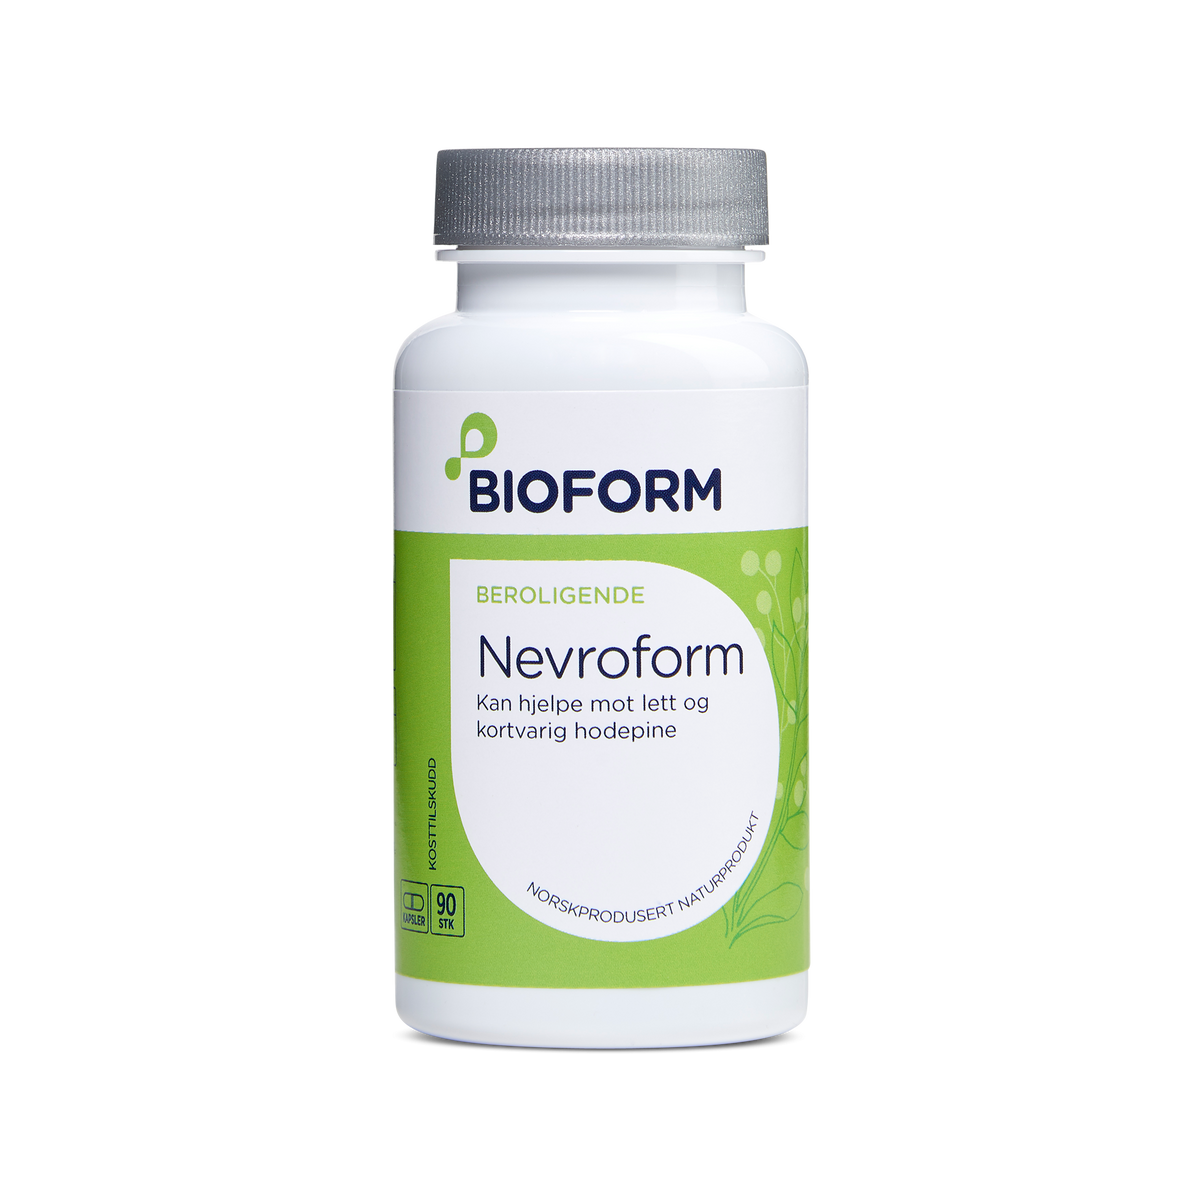 Nevroform